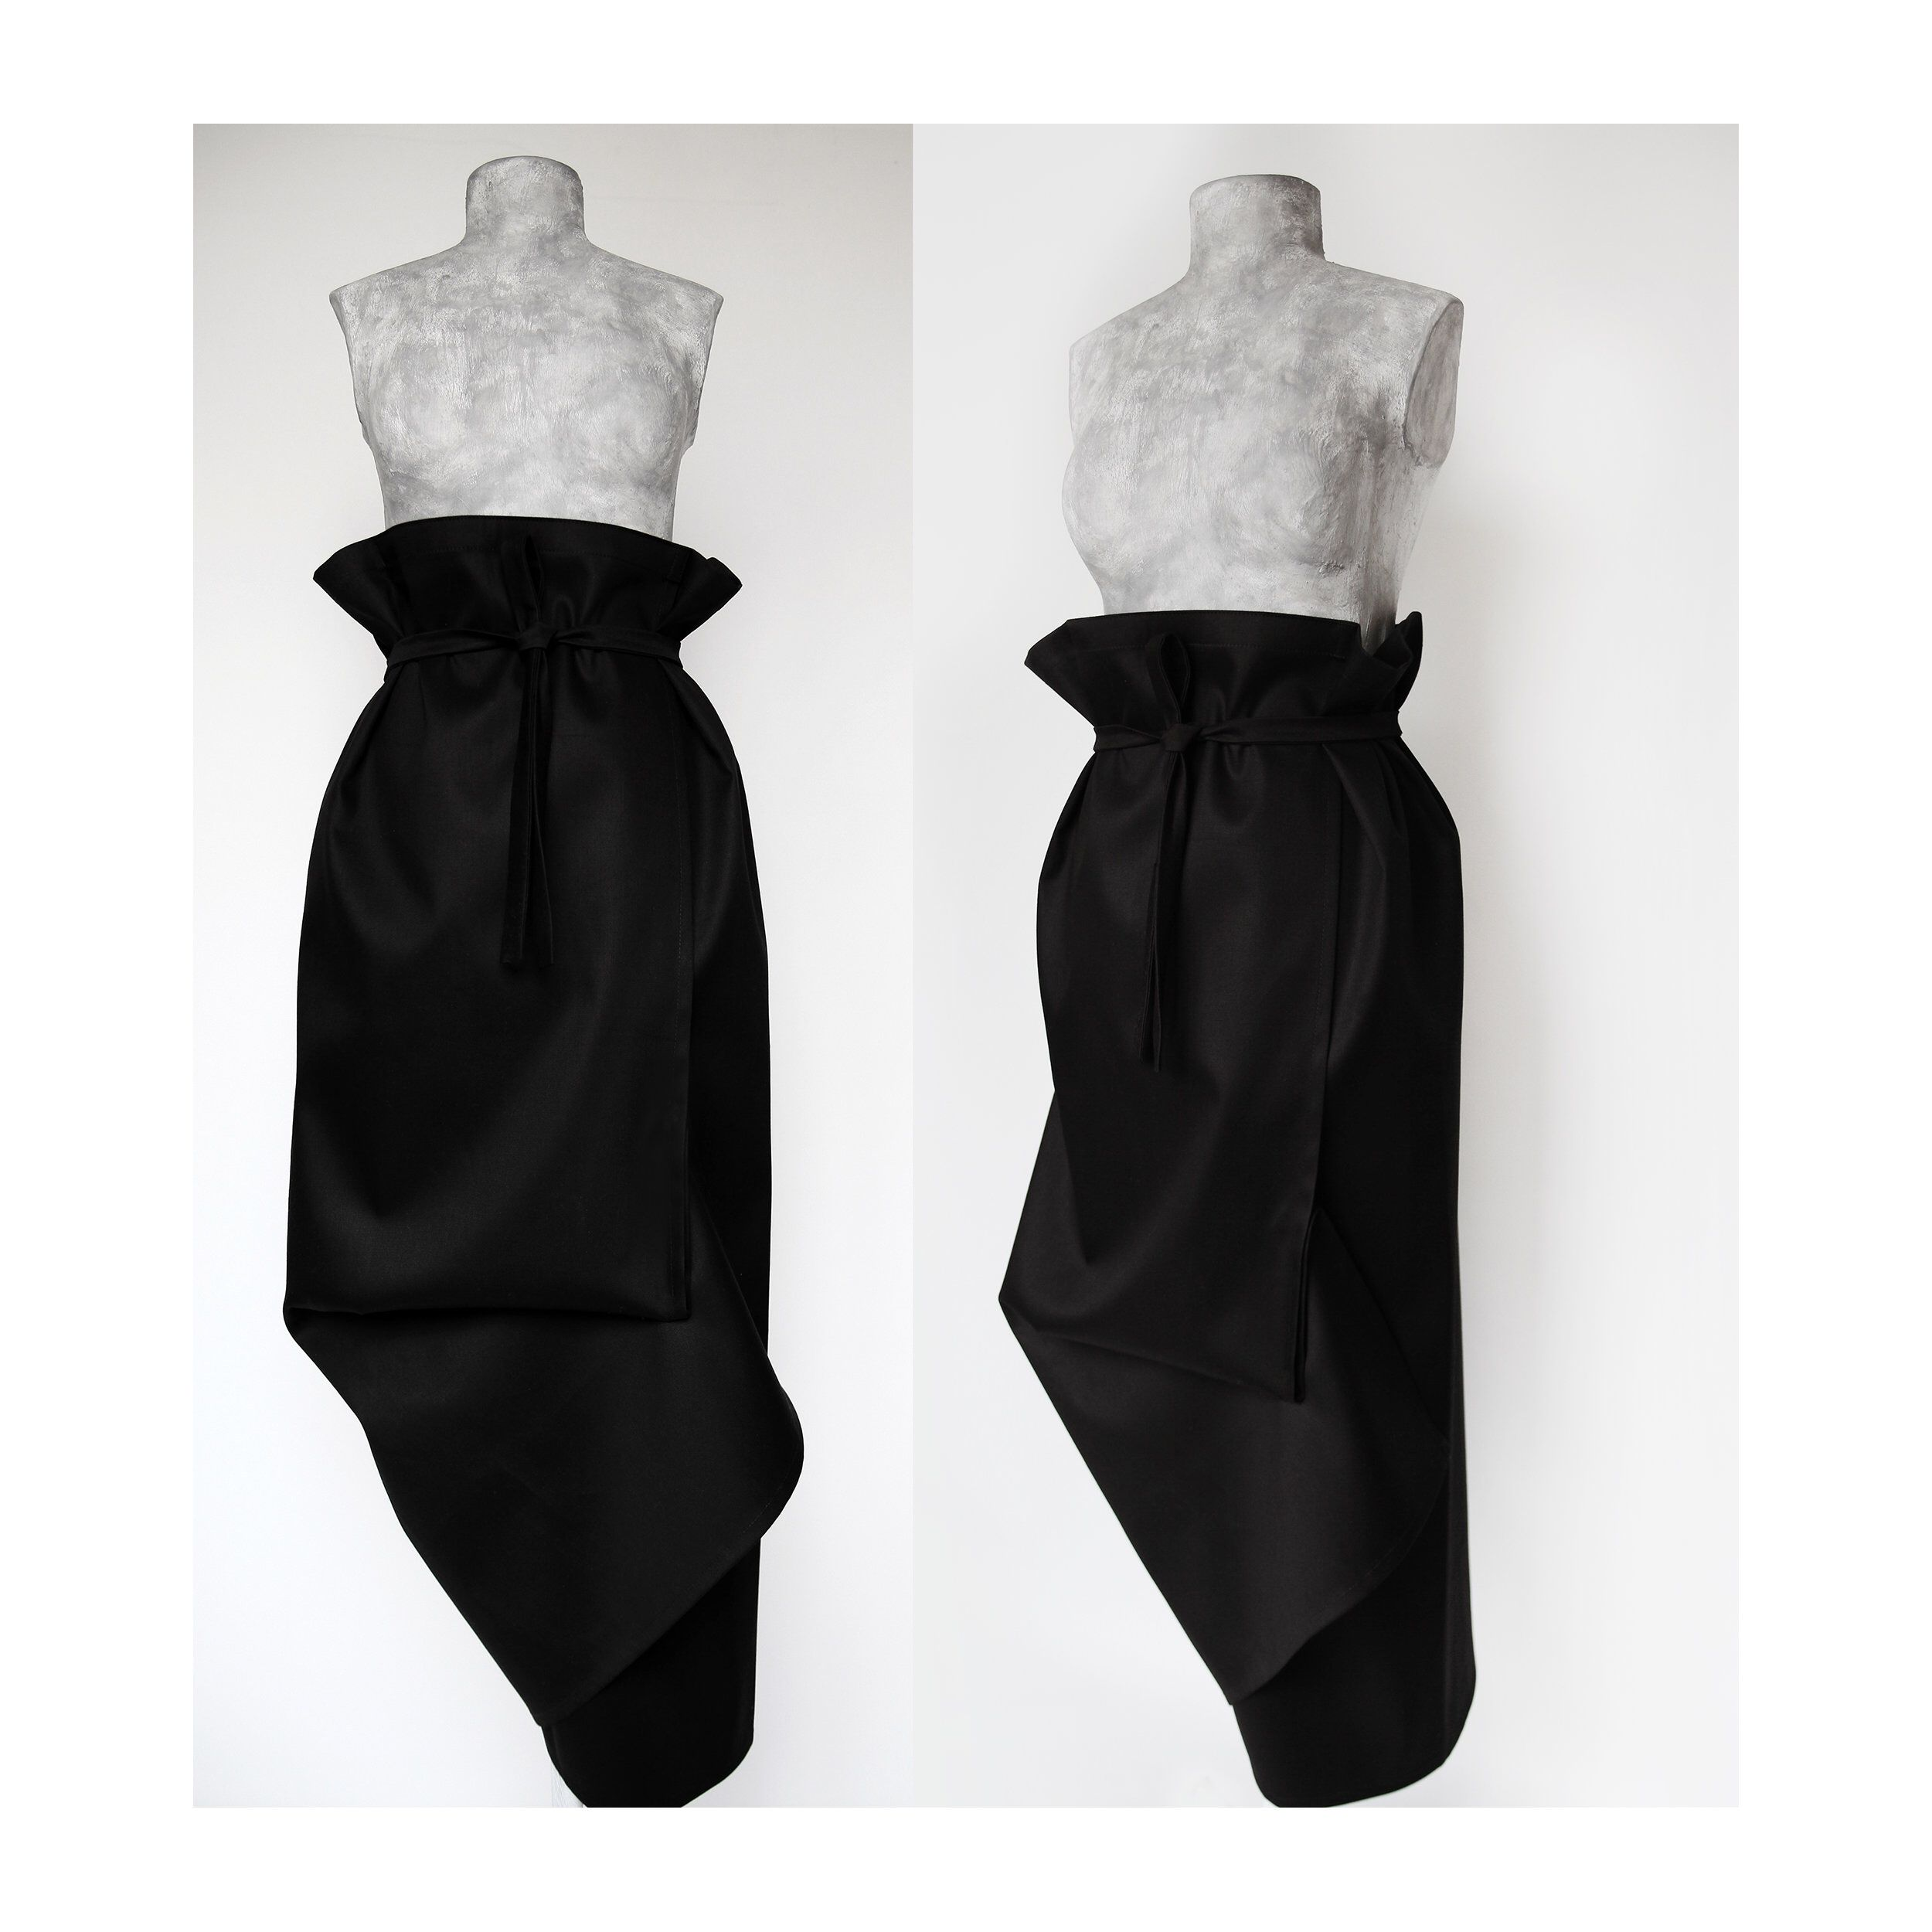 fea82f61a80beb Deconstructed black skirt  asymmetrical black skirt  avant-garde maxi  skirt  extravagant skirt